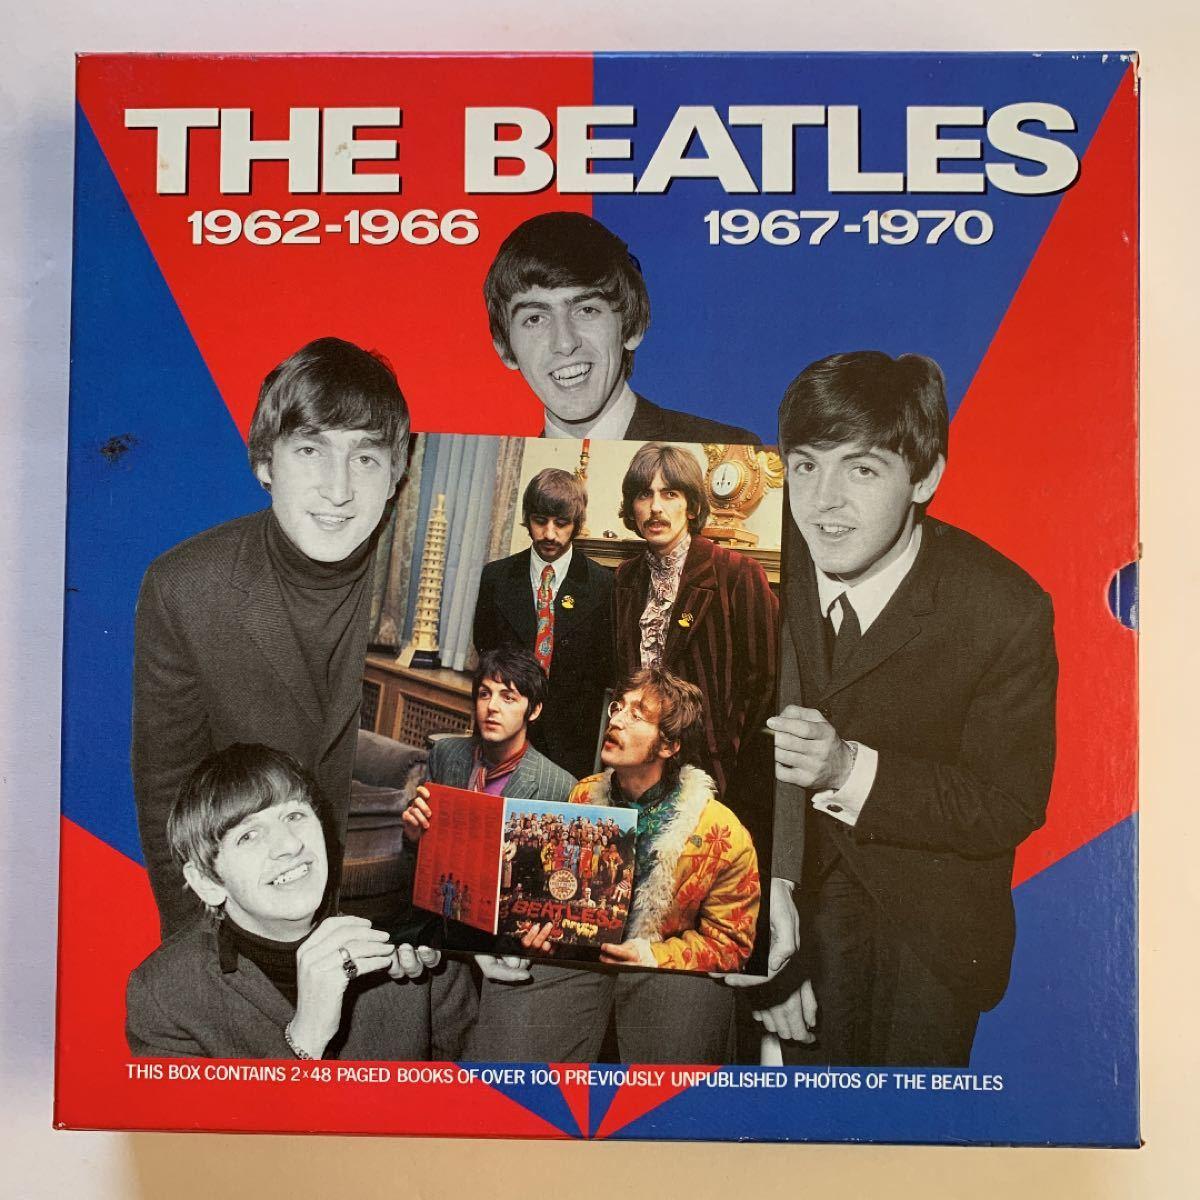 THE BEATLES CD BOX / ビートルズ